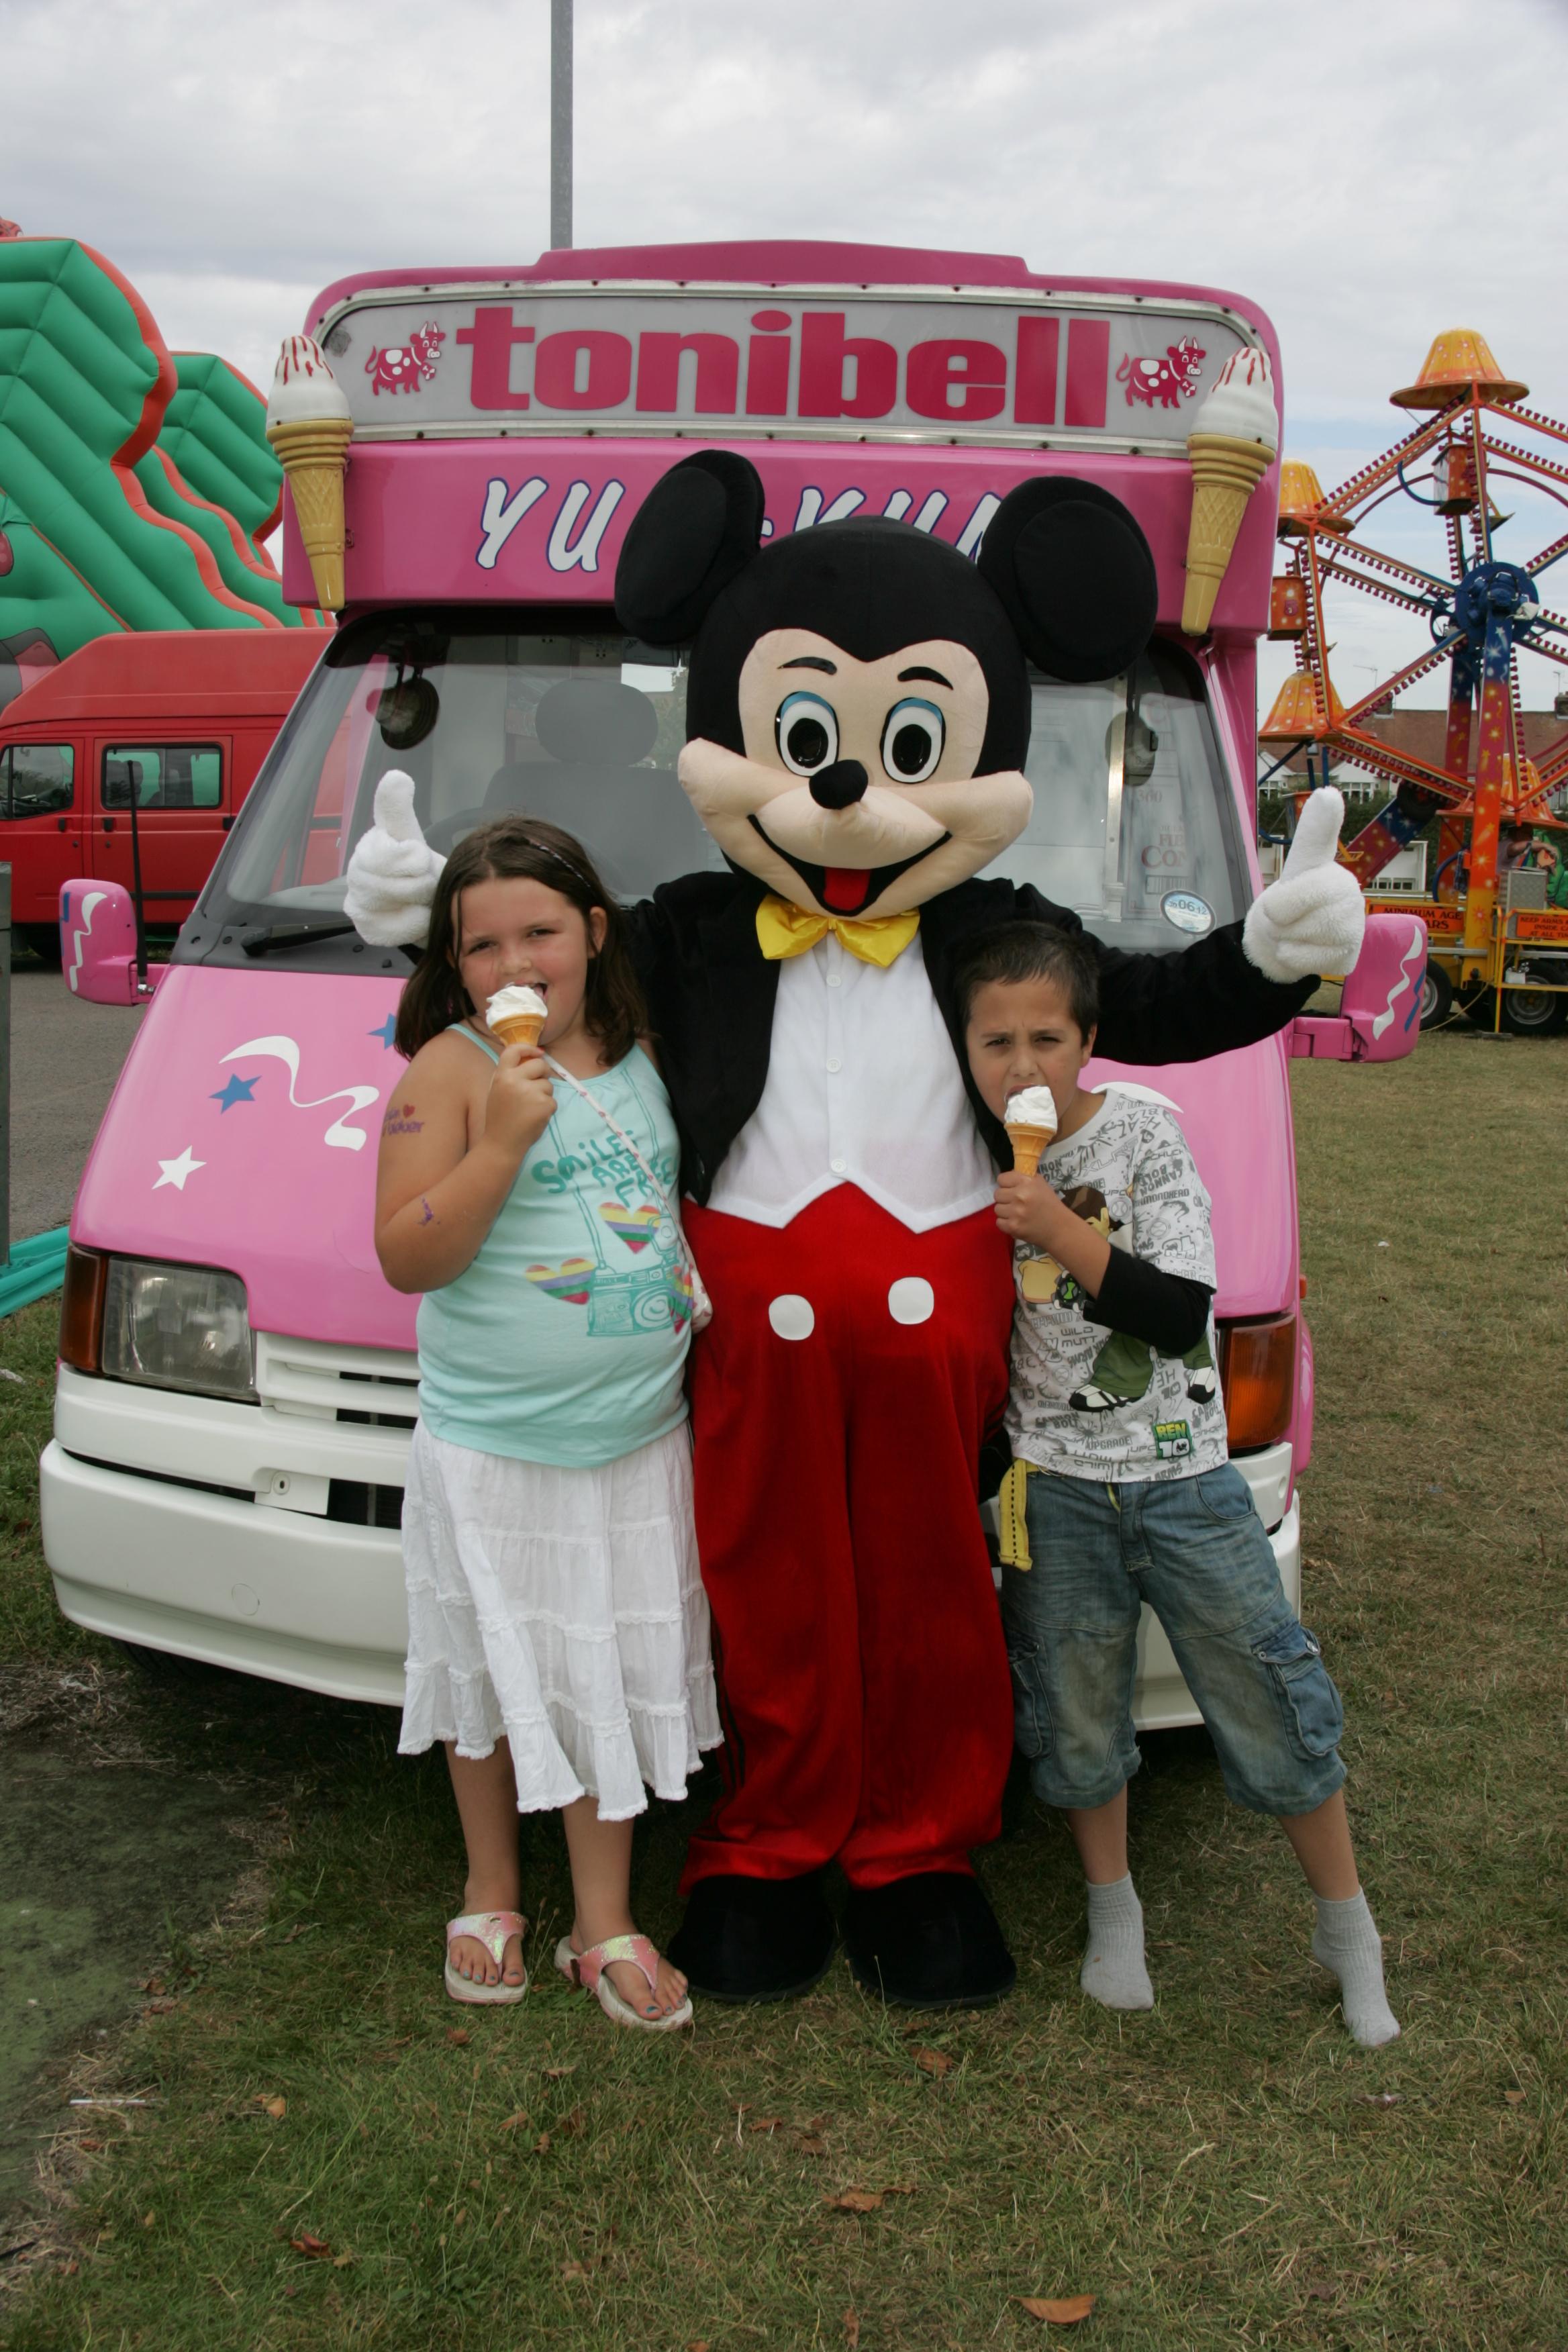 1aa8f1bb3b Tonibell Ice Cream Van Hire Kent London Essex Surrey   South East England  ...